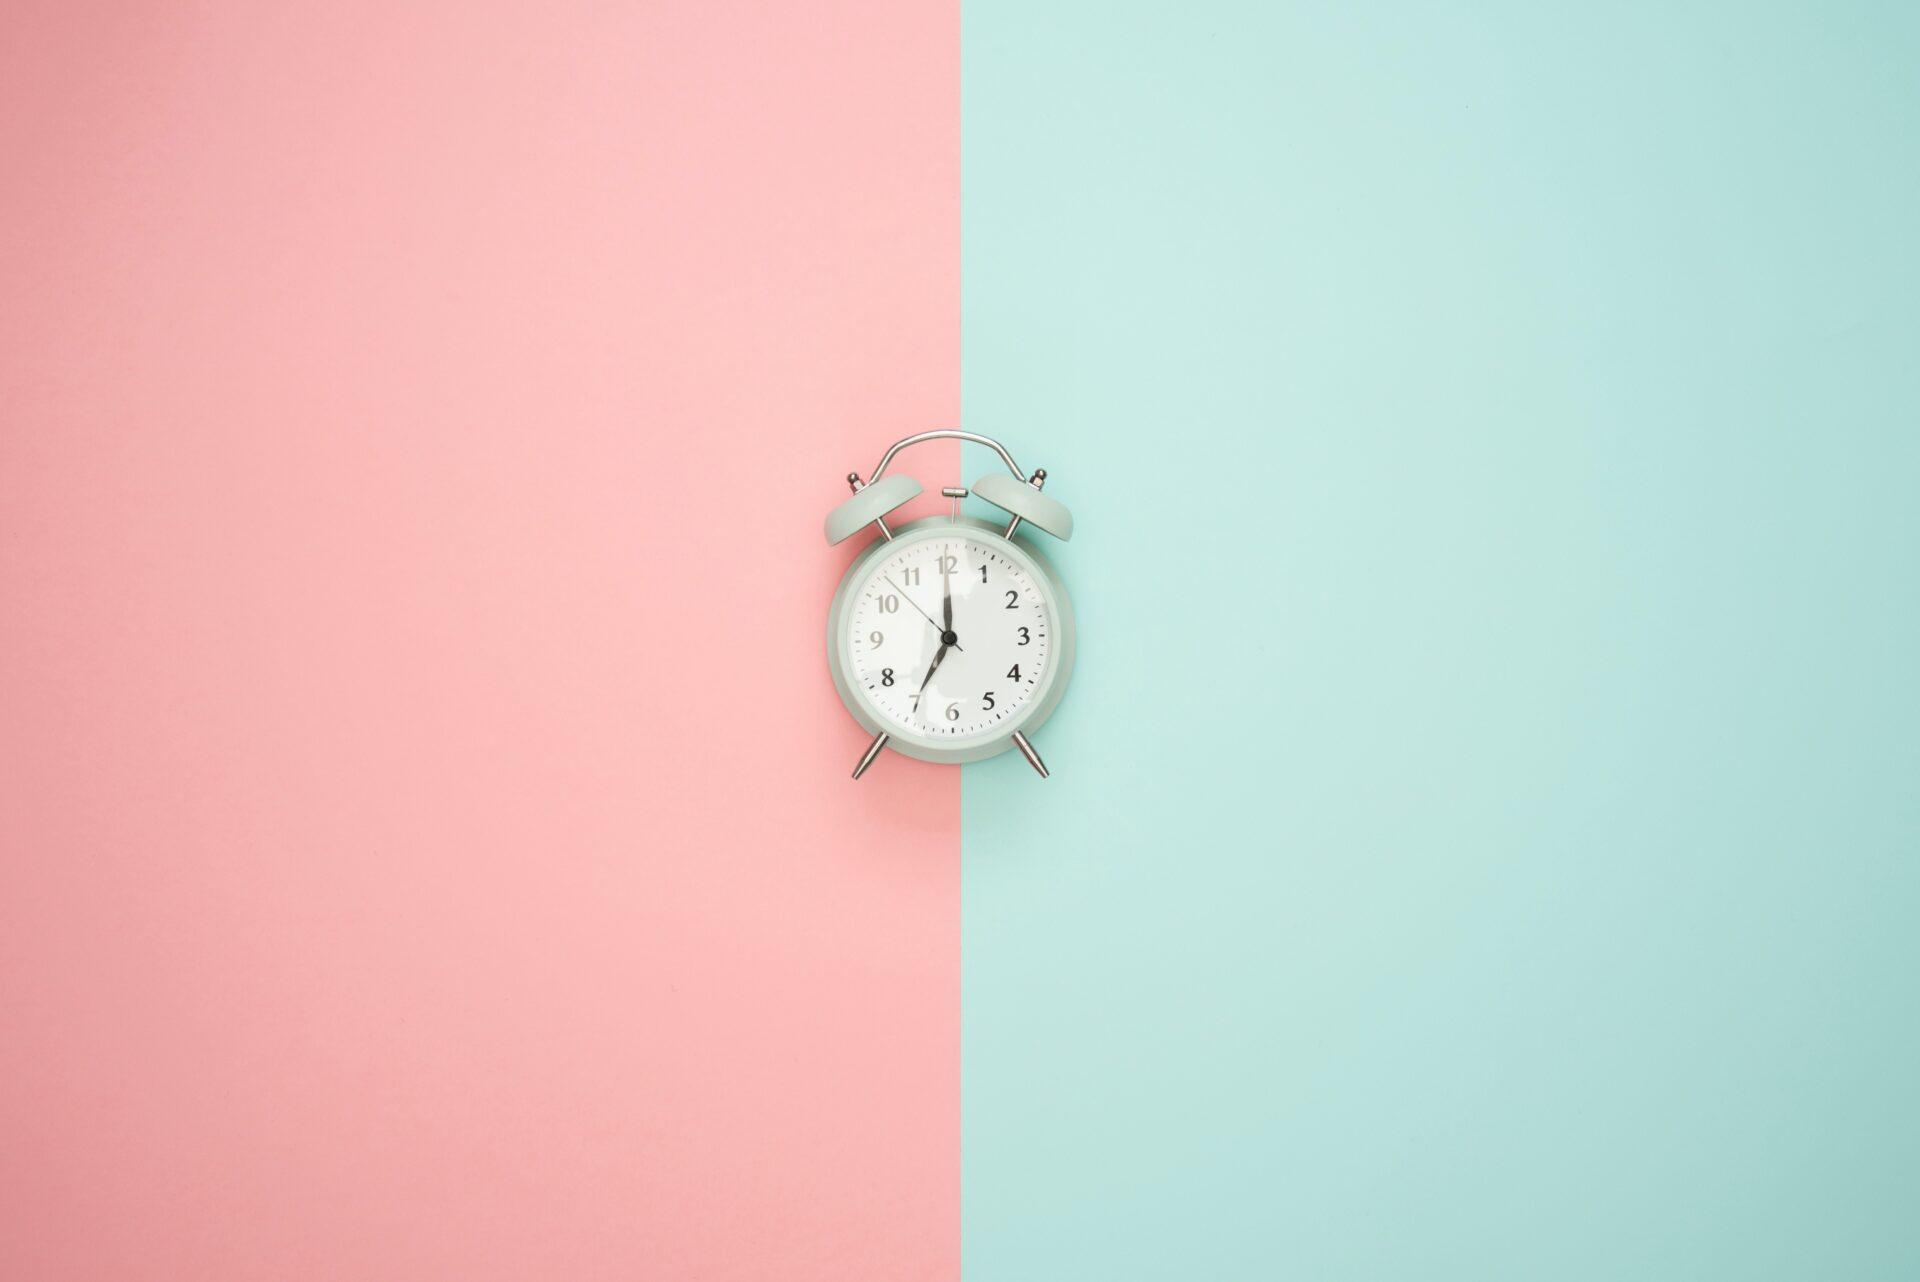 orologio su sfondo rosa verde